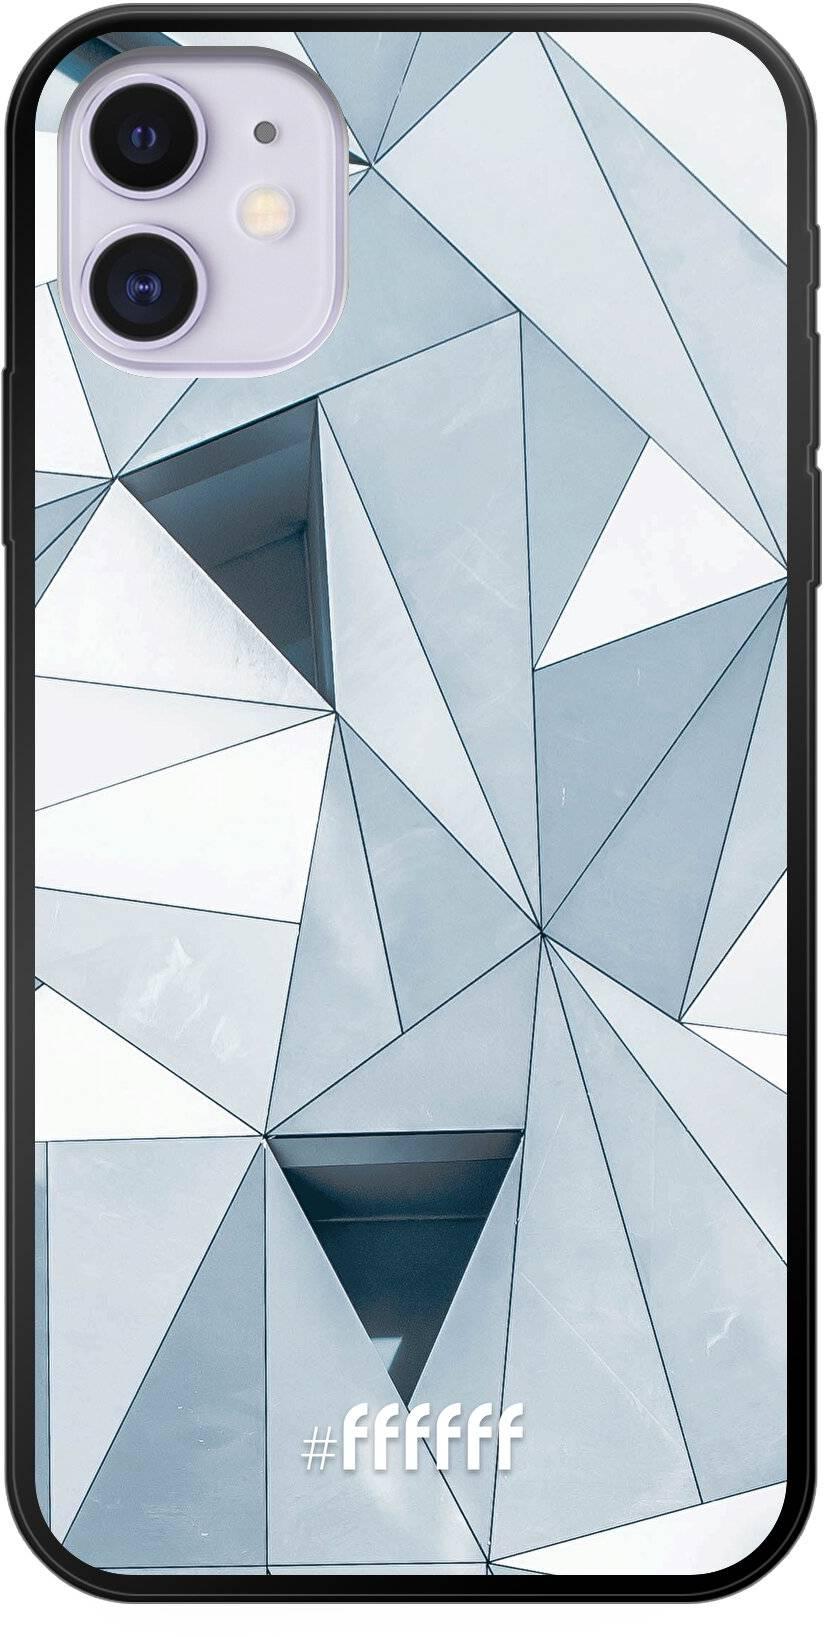 Mirrored Polygon iPhone 11